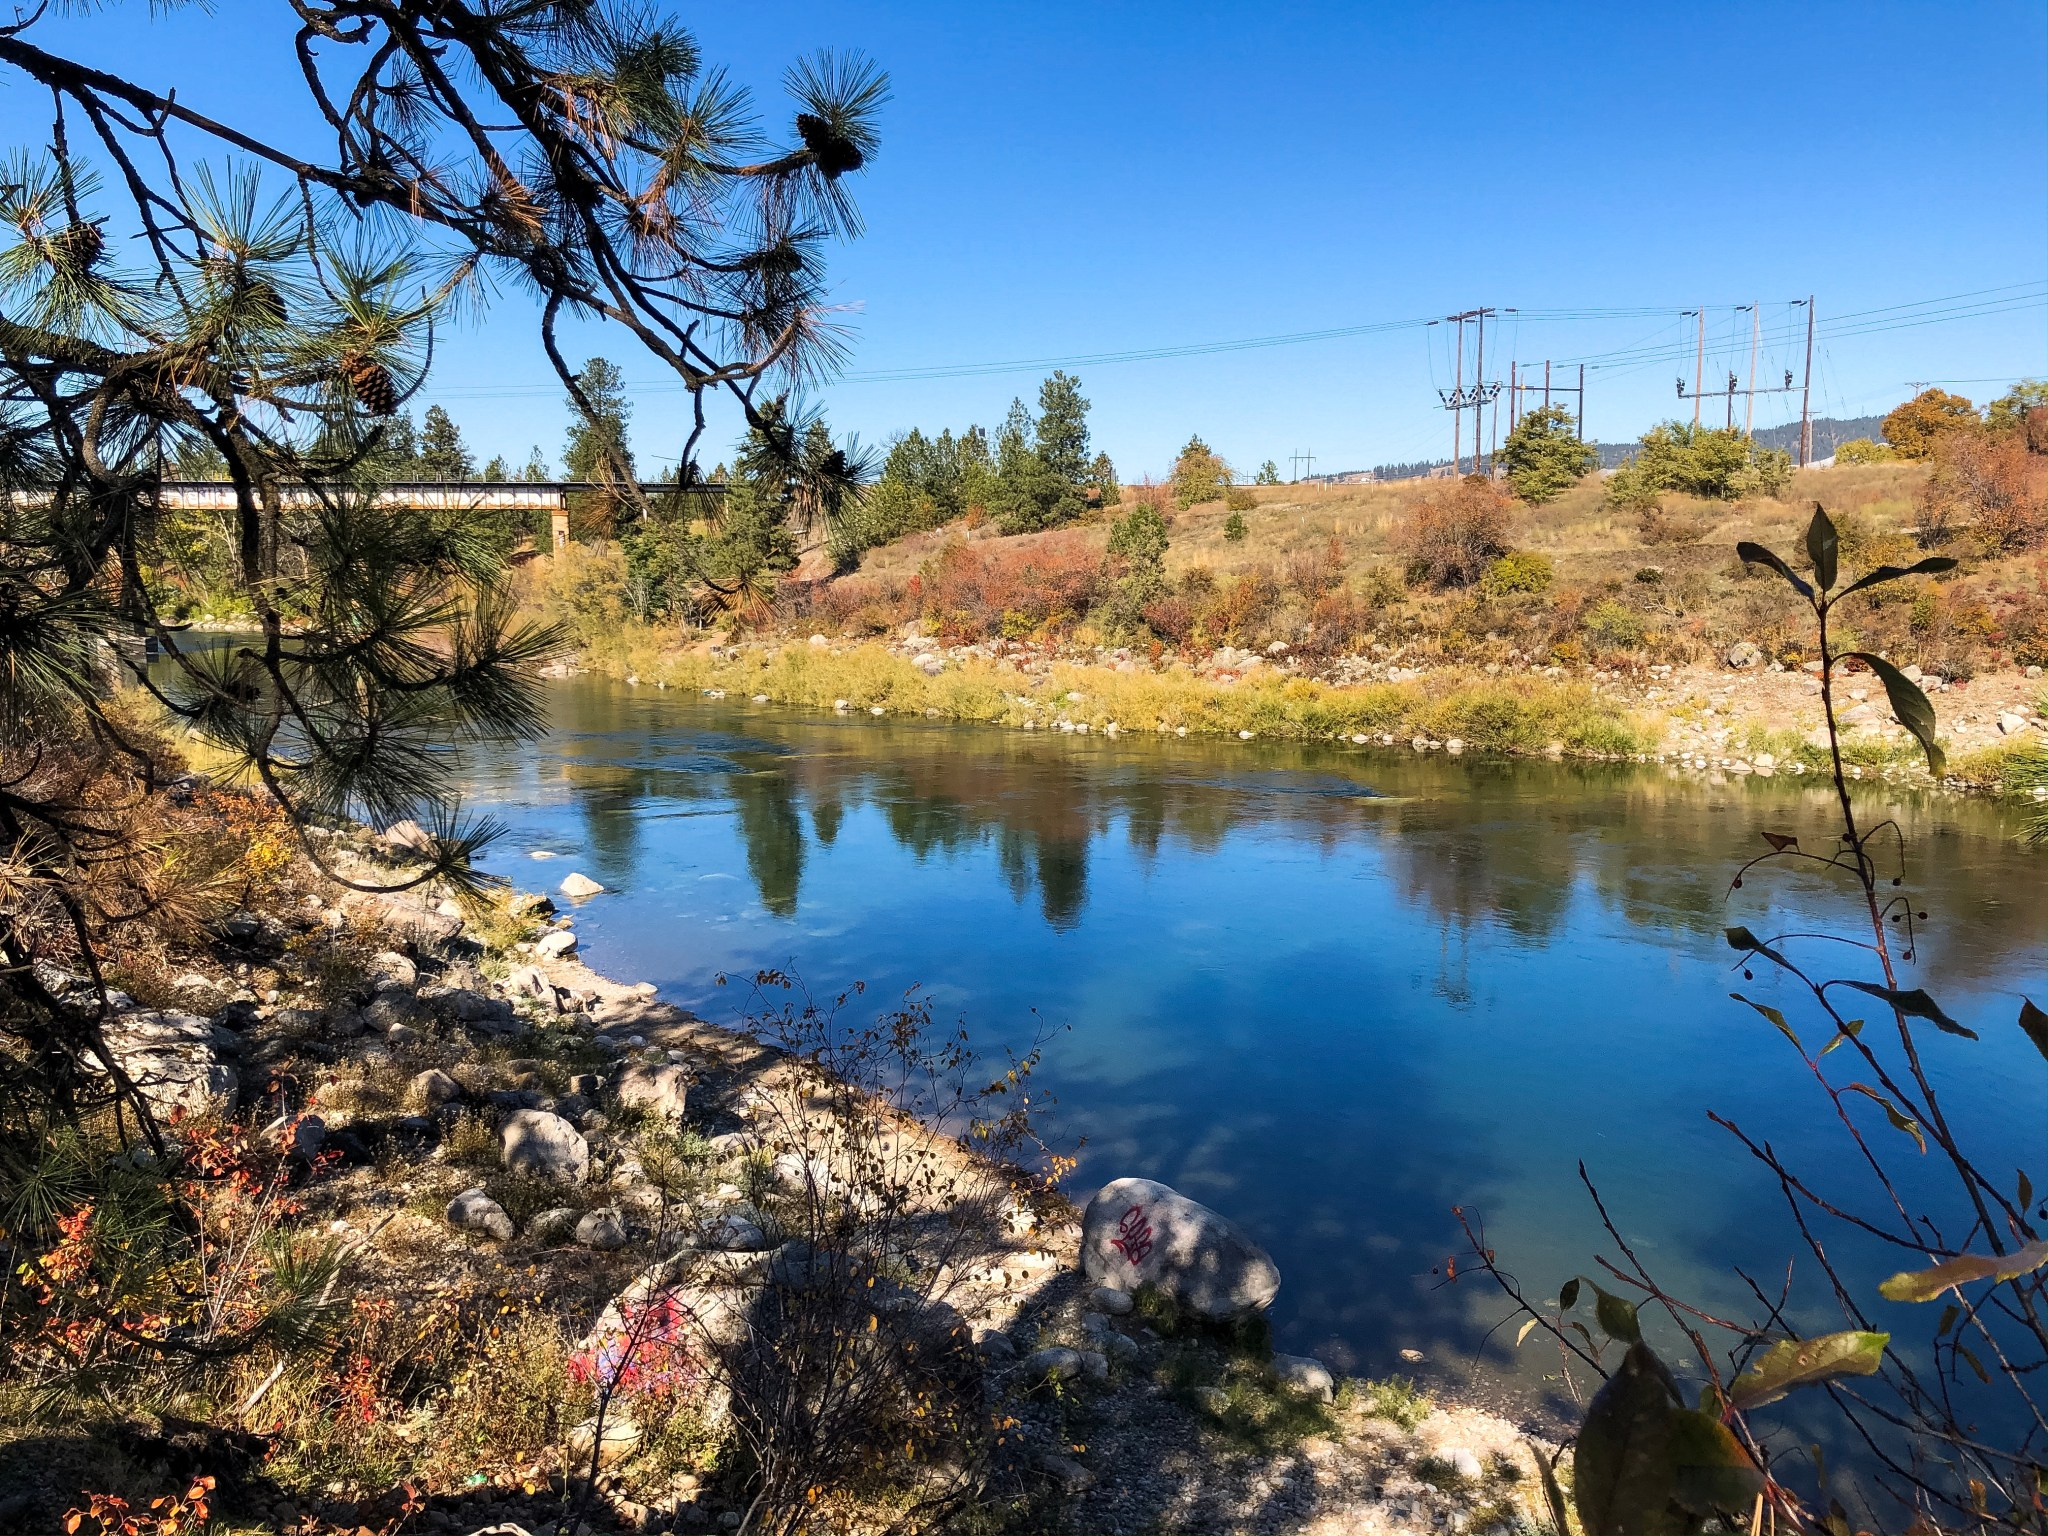 A view of the Spokane River from the Centennial Trail near Spokane Valley, Washington.